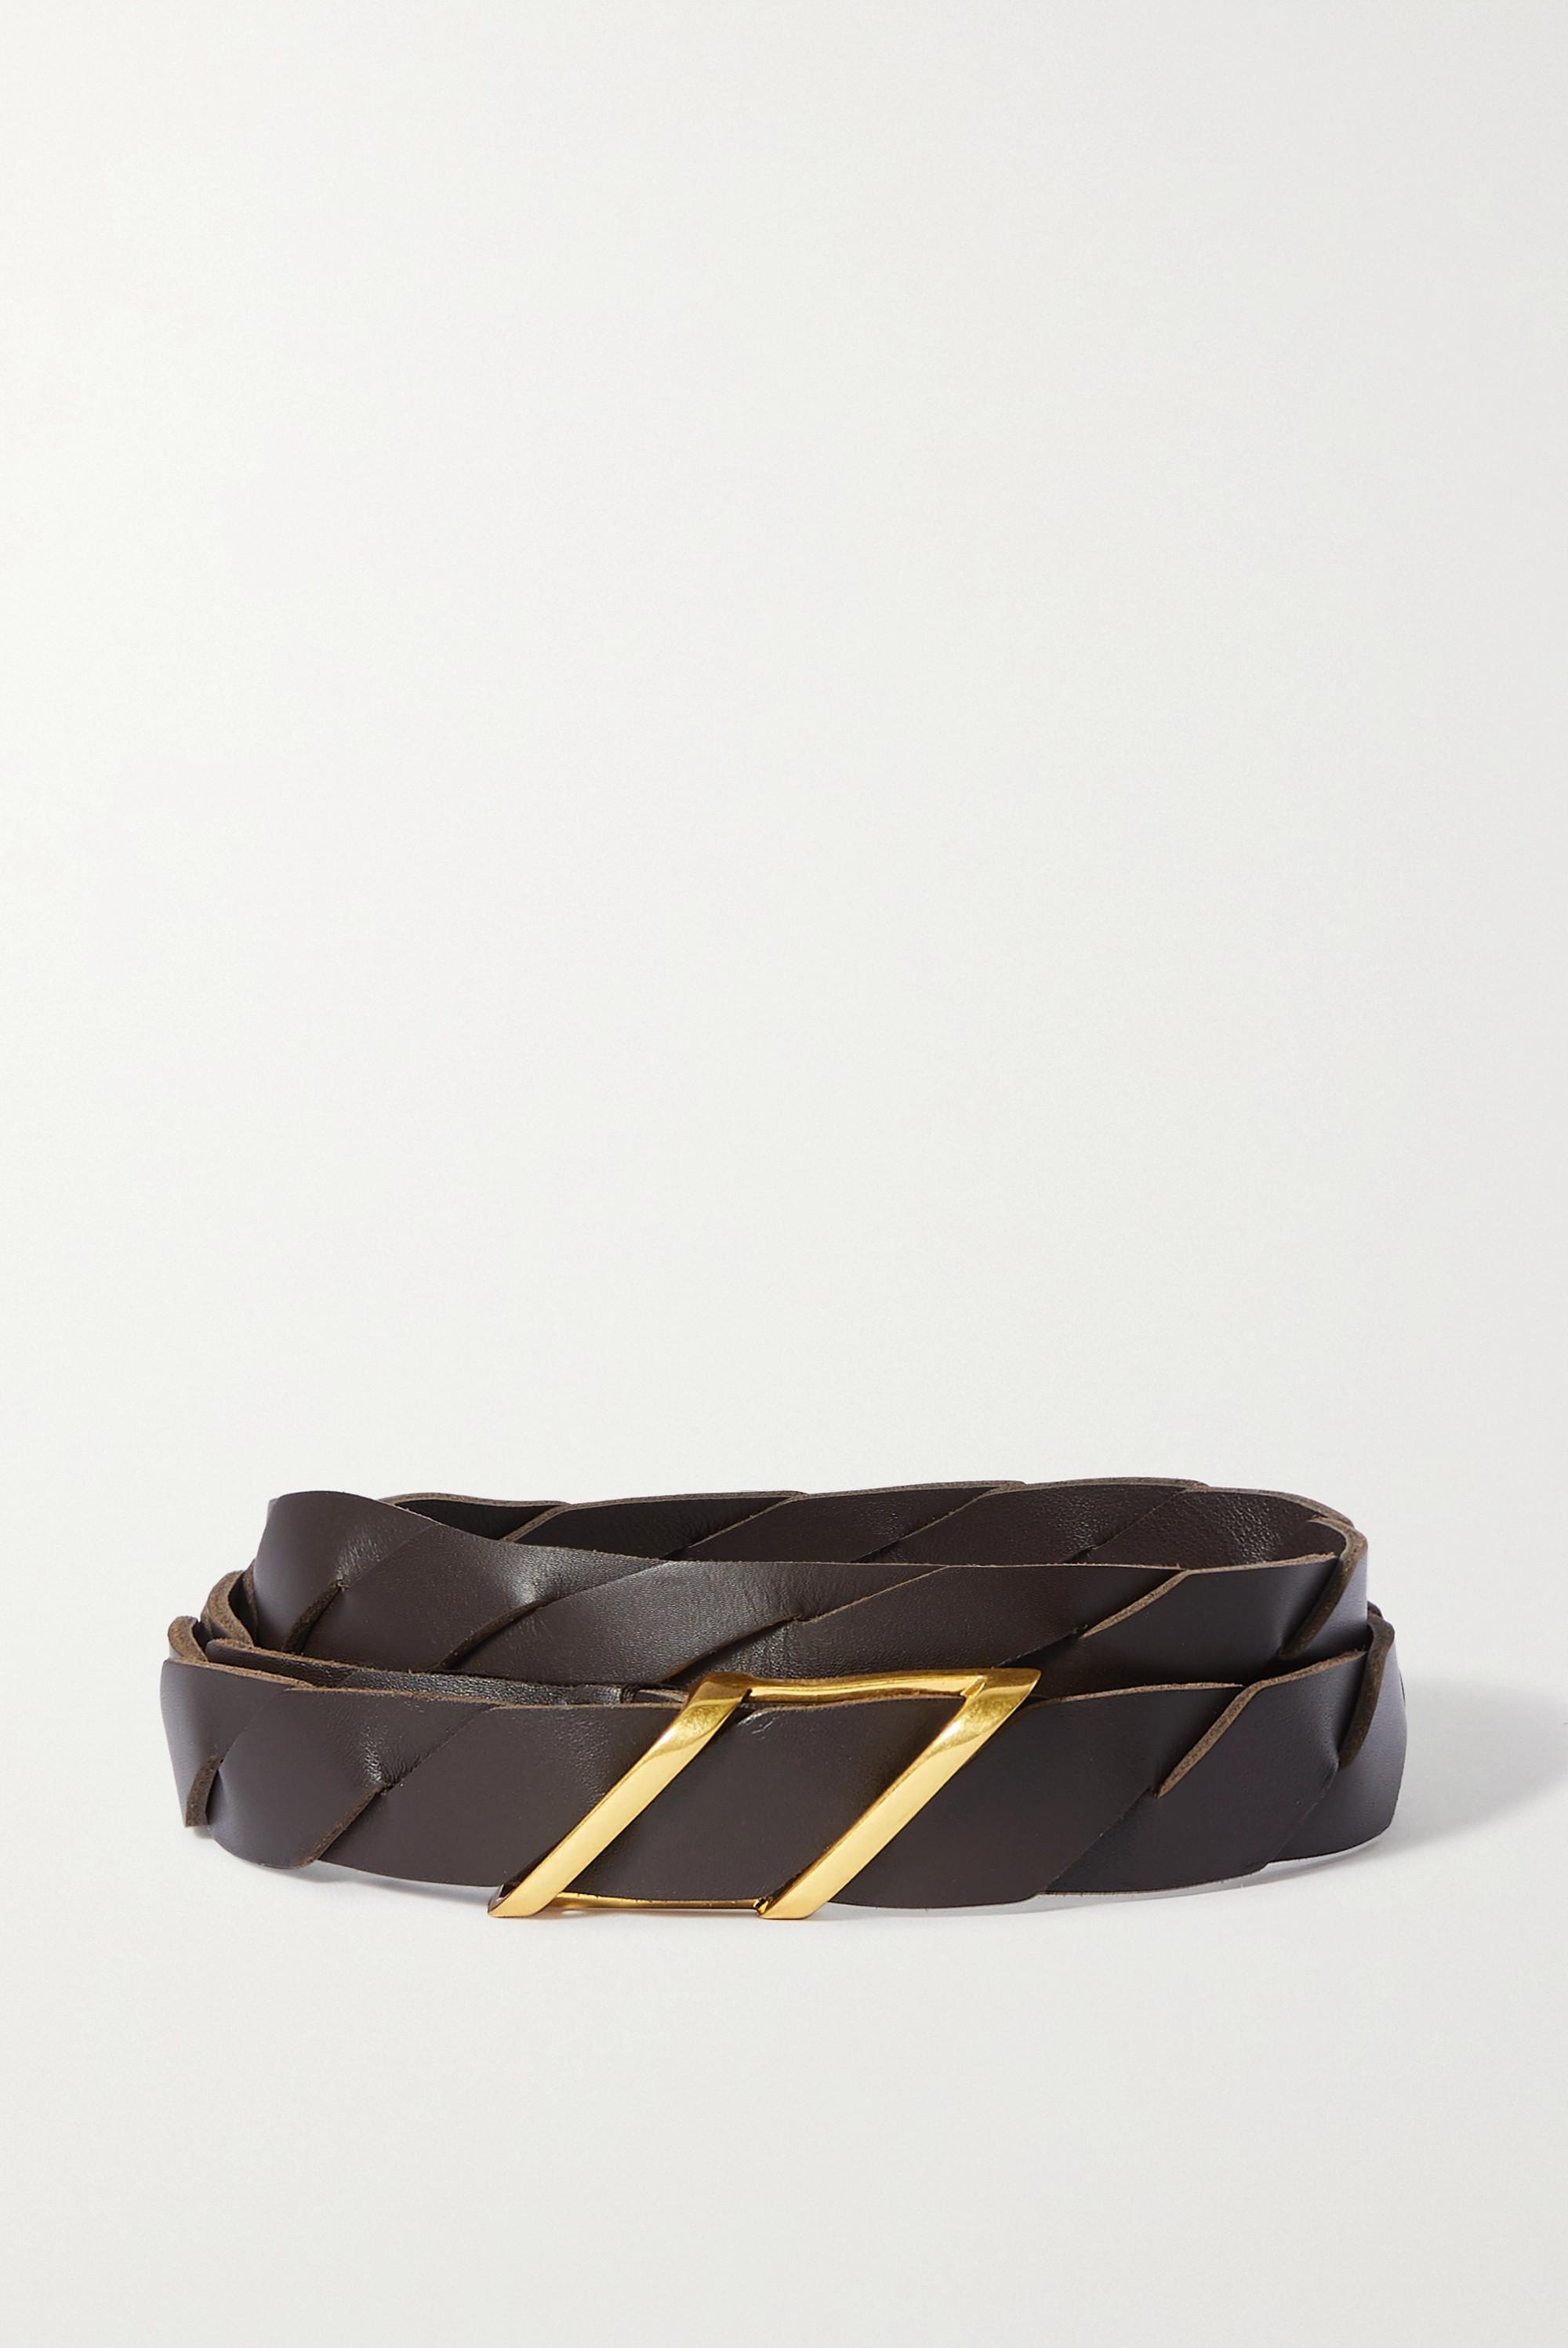 Bottega Veneta - Leather belt